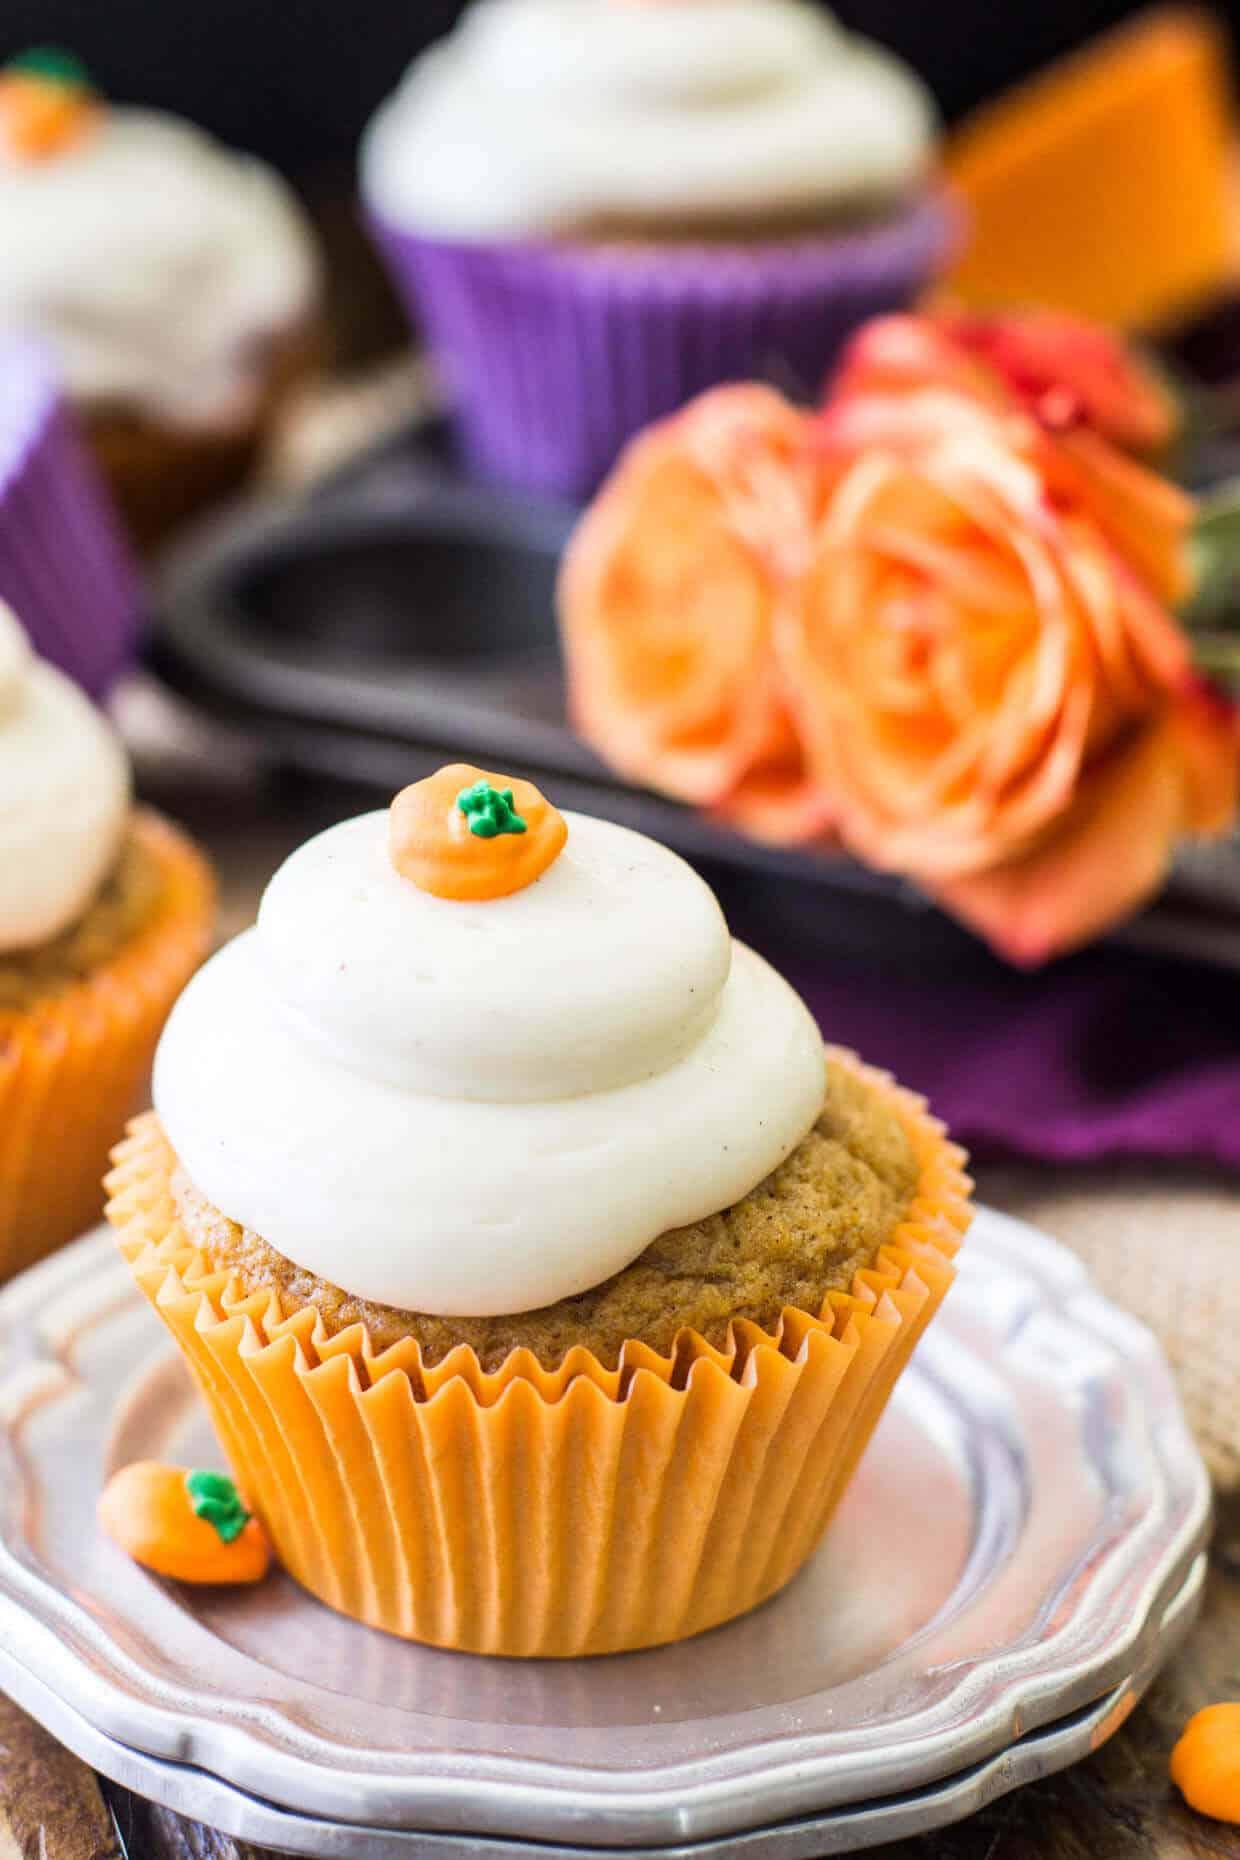 Pumpkin Cupcakes Pumpkin Cupcakes With Brown Sugar Cream Cheese Frosting  Sugar